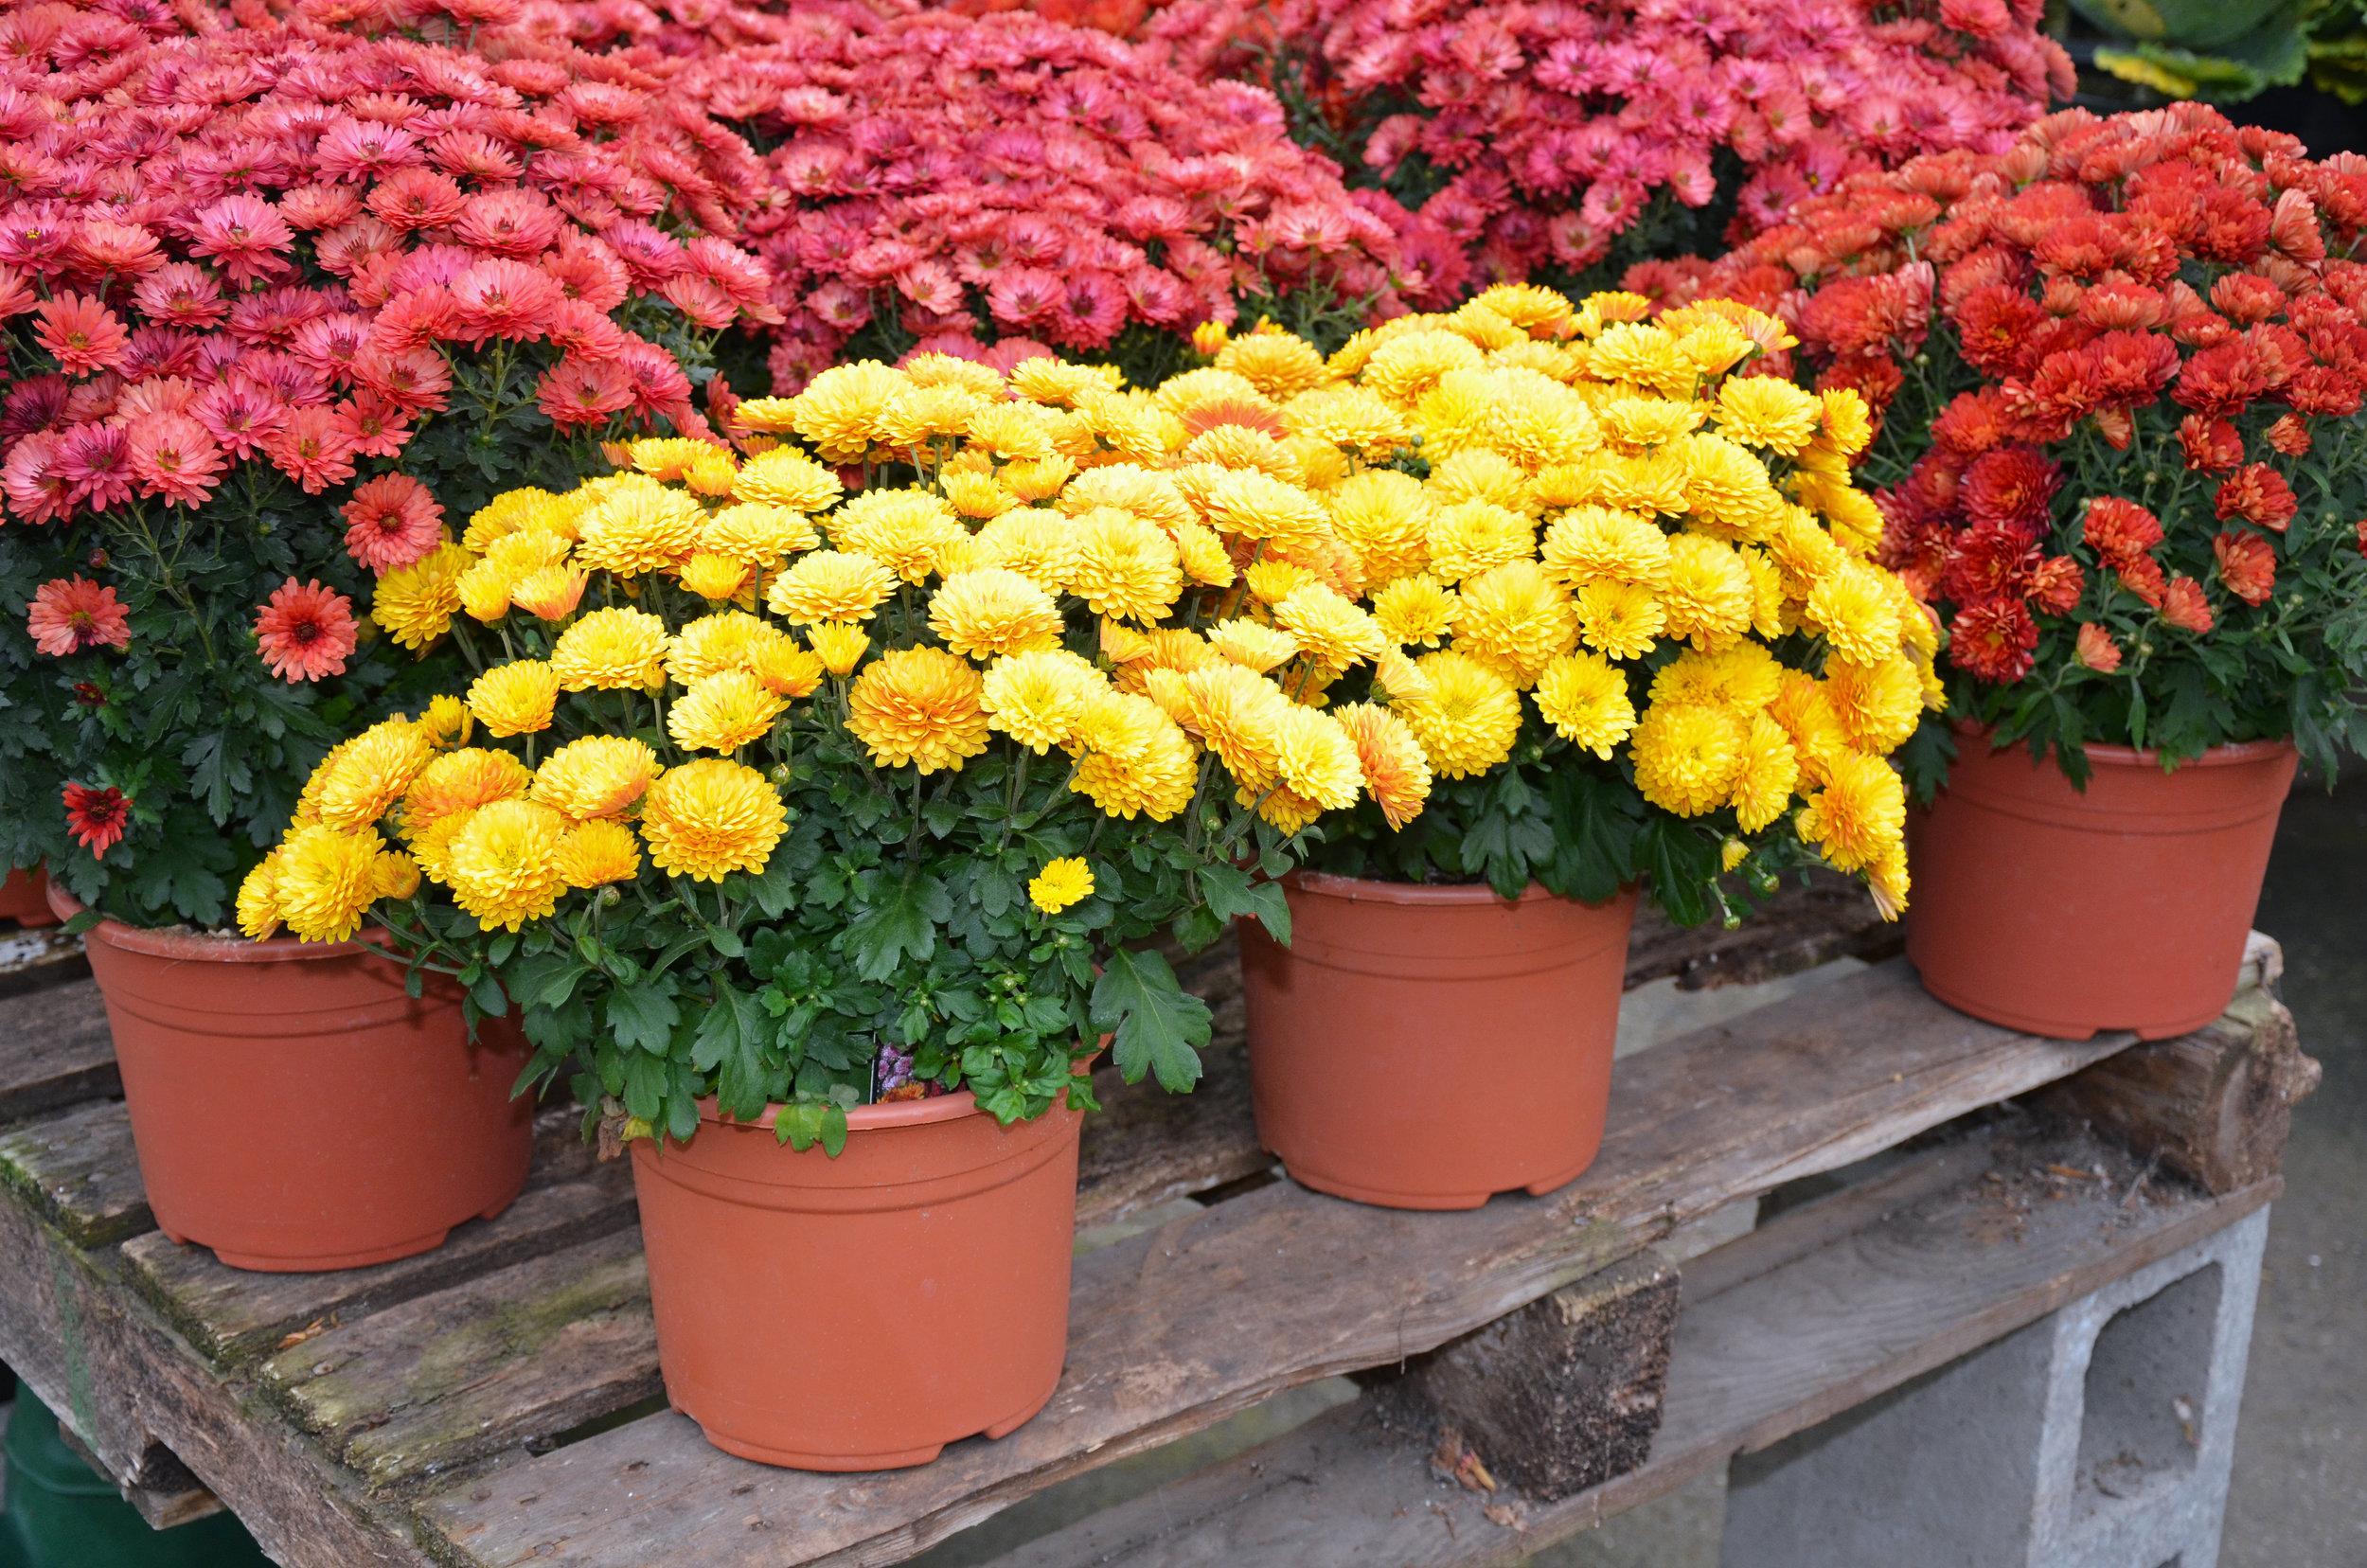 Autumn-chrysanthemum-flowers-481880019_4928x3264.jpeg